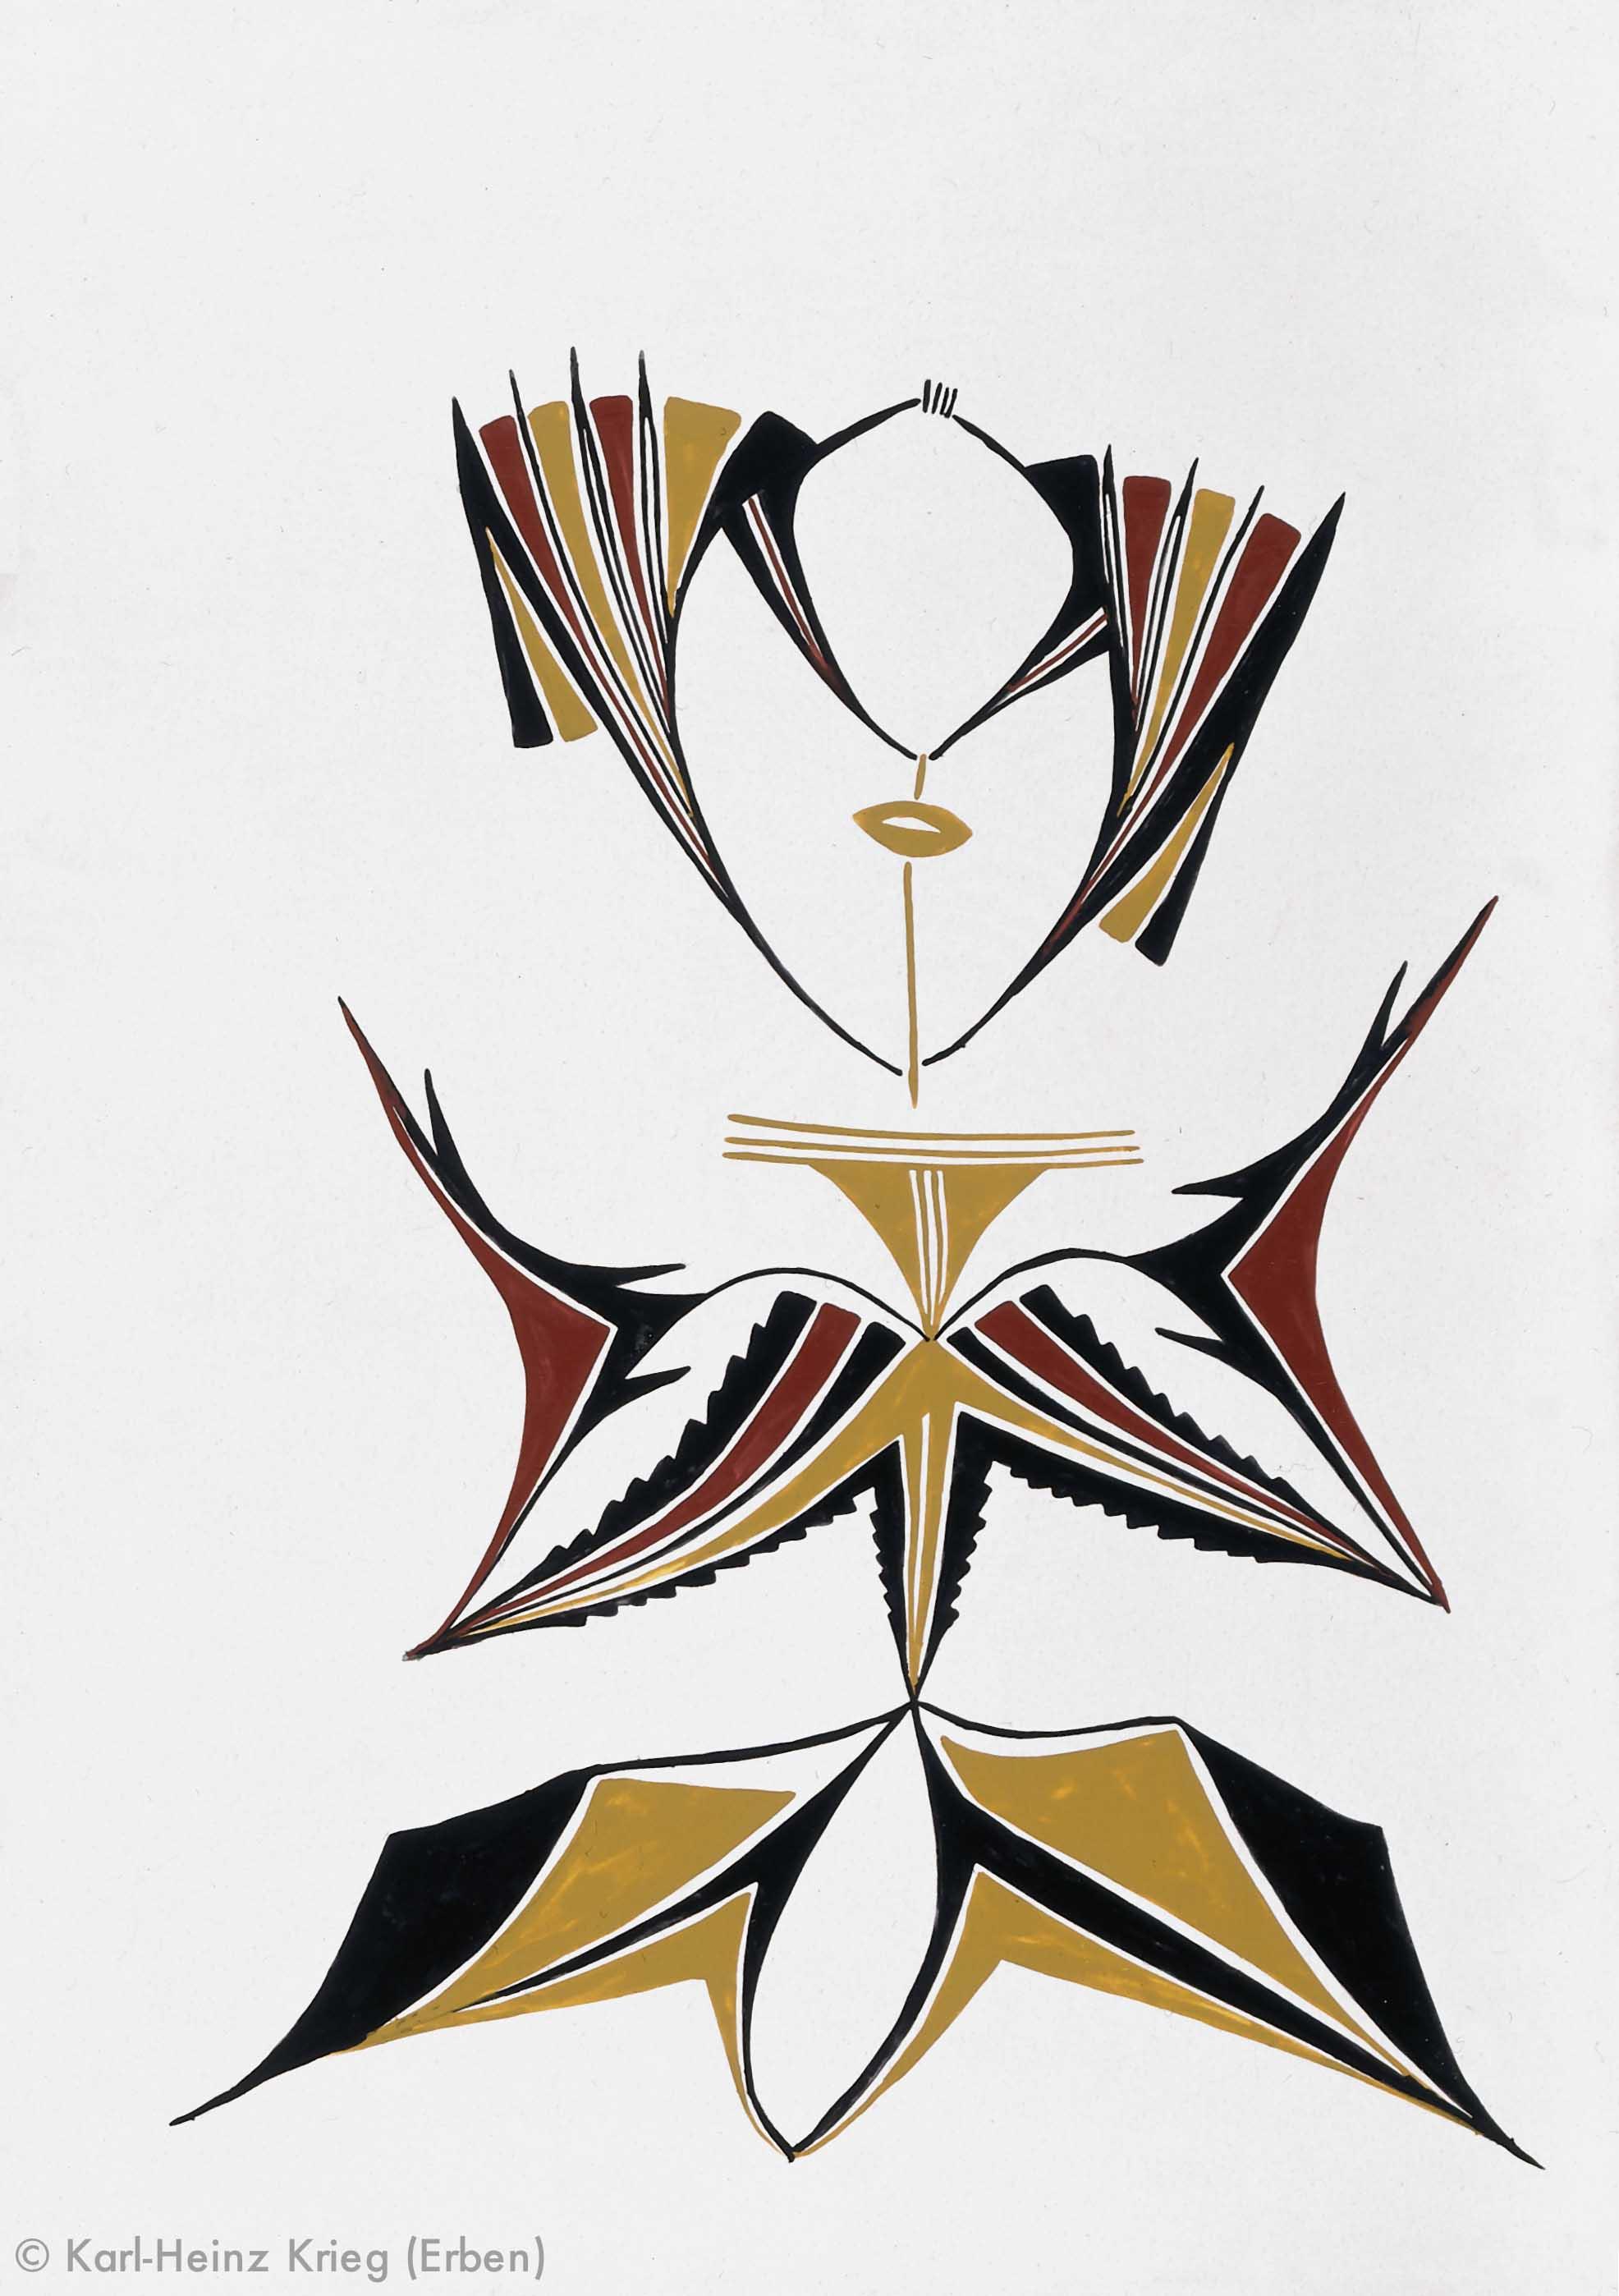 Kolouma Sovogi Komagavhodai, Zèghèlèwöni, Kosuvhodai, 1996 Acryl/Zeichenkarton, grundiert 59 x 83,8 cm Werknr. 35–1996/90